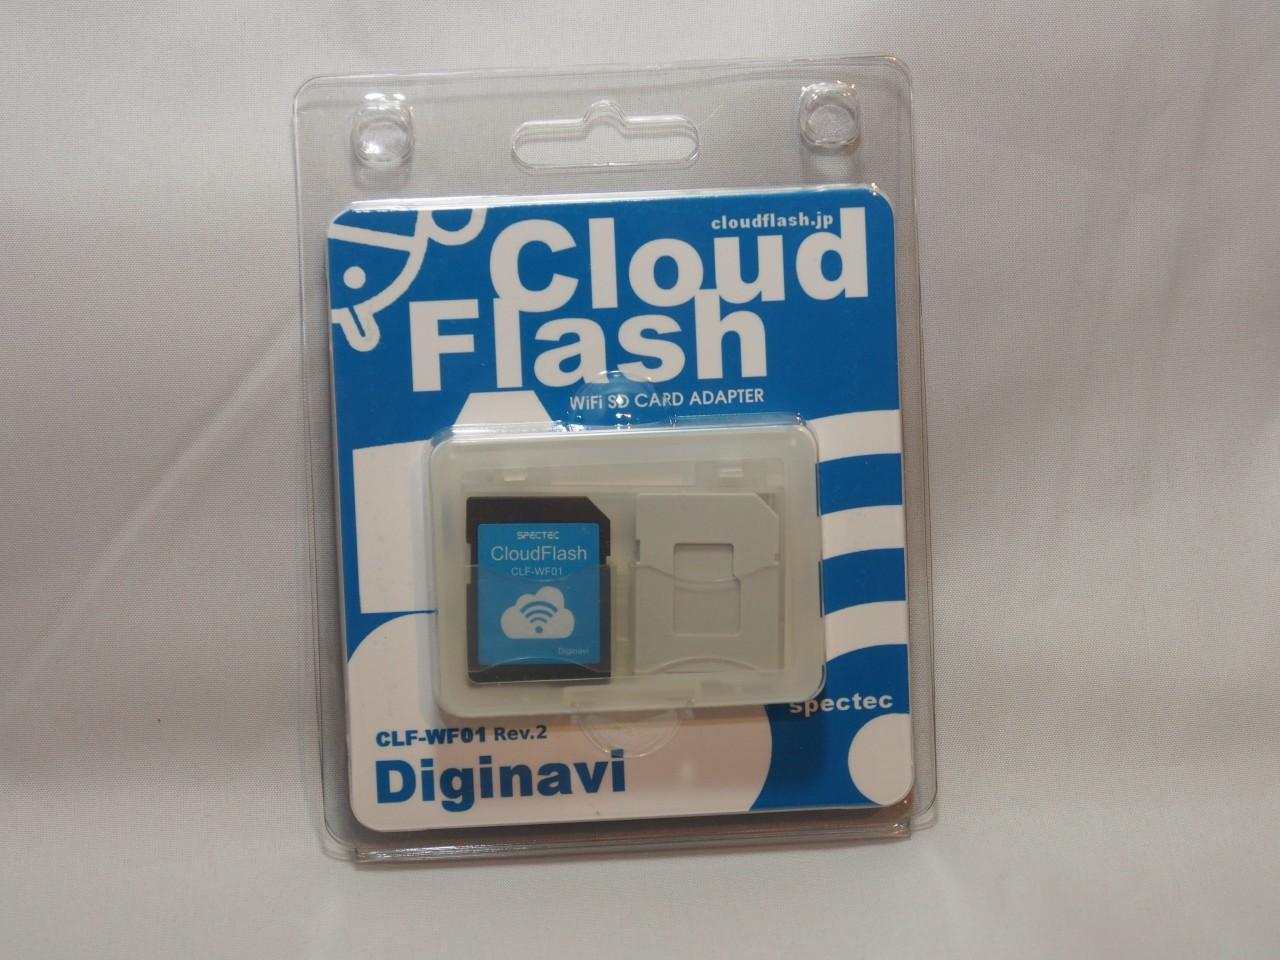 CloudFlash